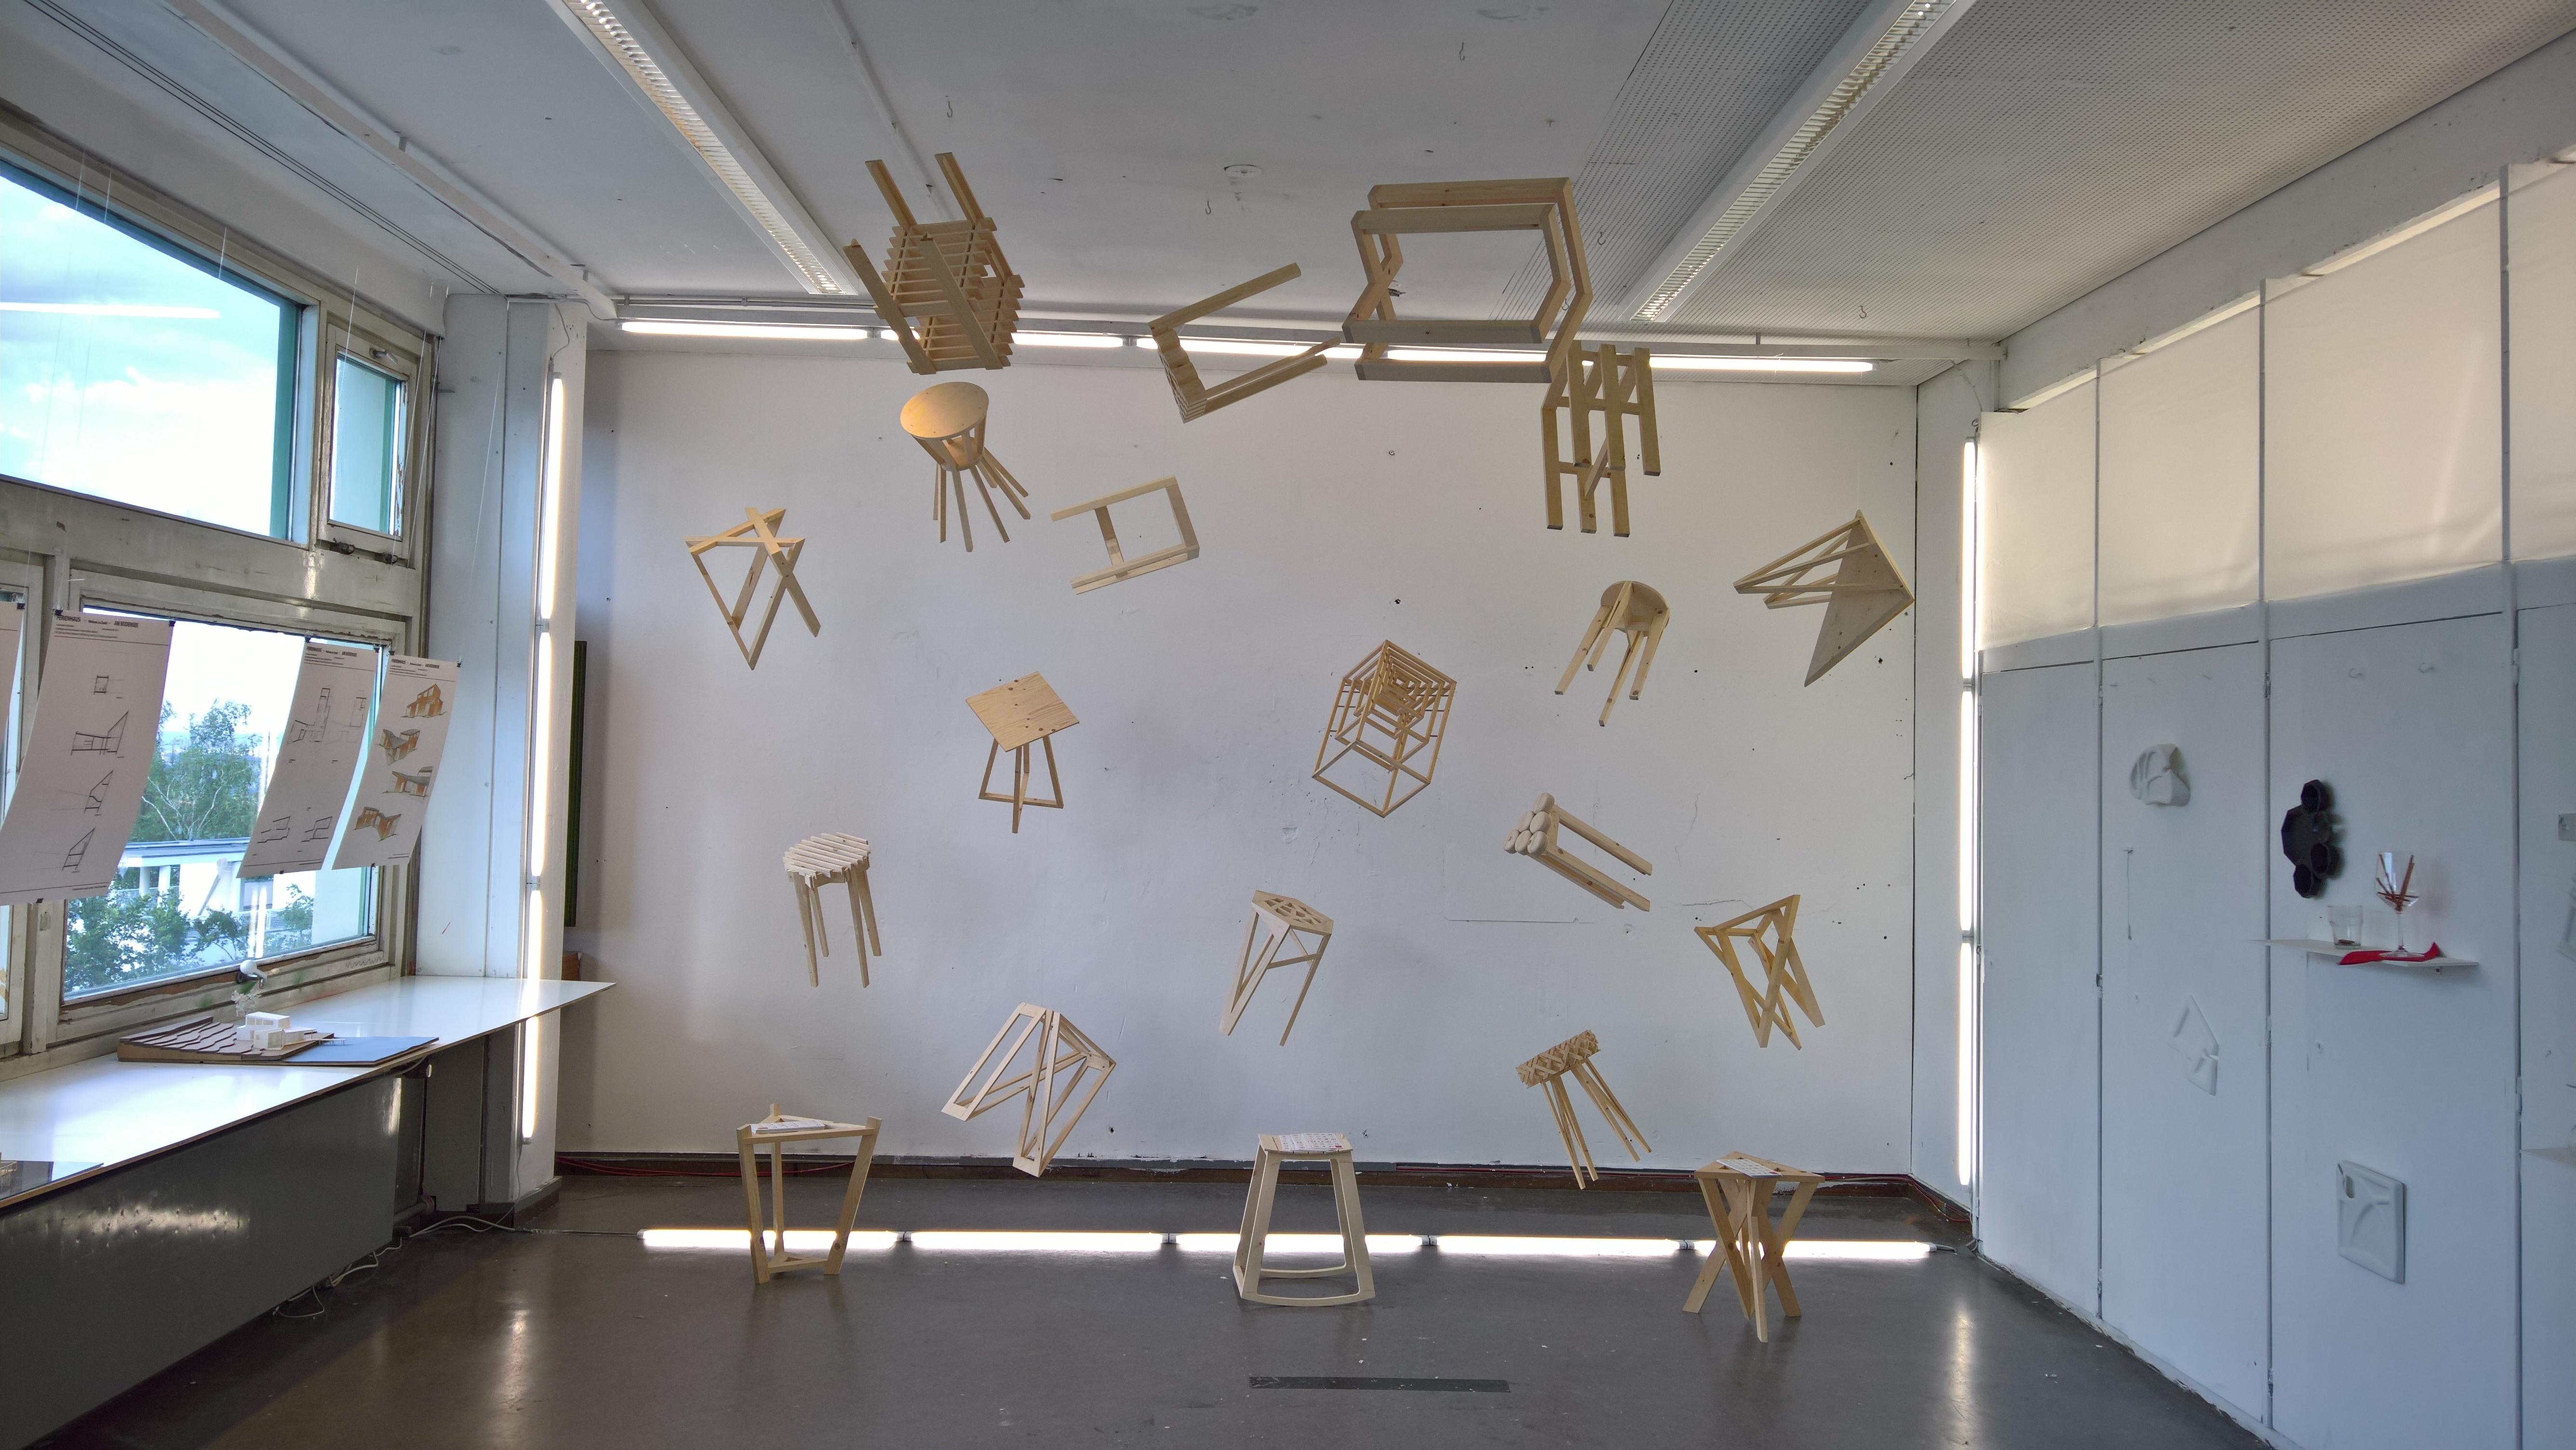 Sitting - From Idea to Object, as seen at the Akademie der Bildenden Künste Stuttgart Rundgang 2017